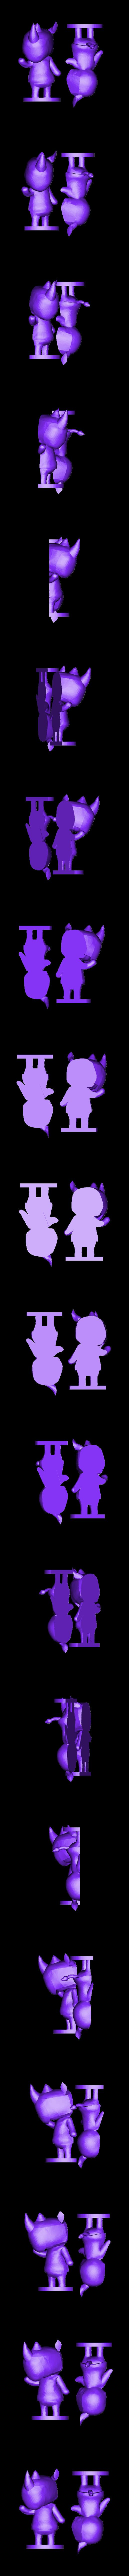 merengue split.stl Download free STL file Merengue from Animal Crossing • 3D print template, skelei